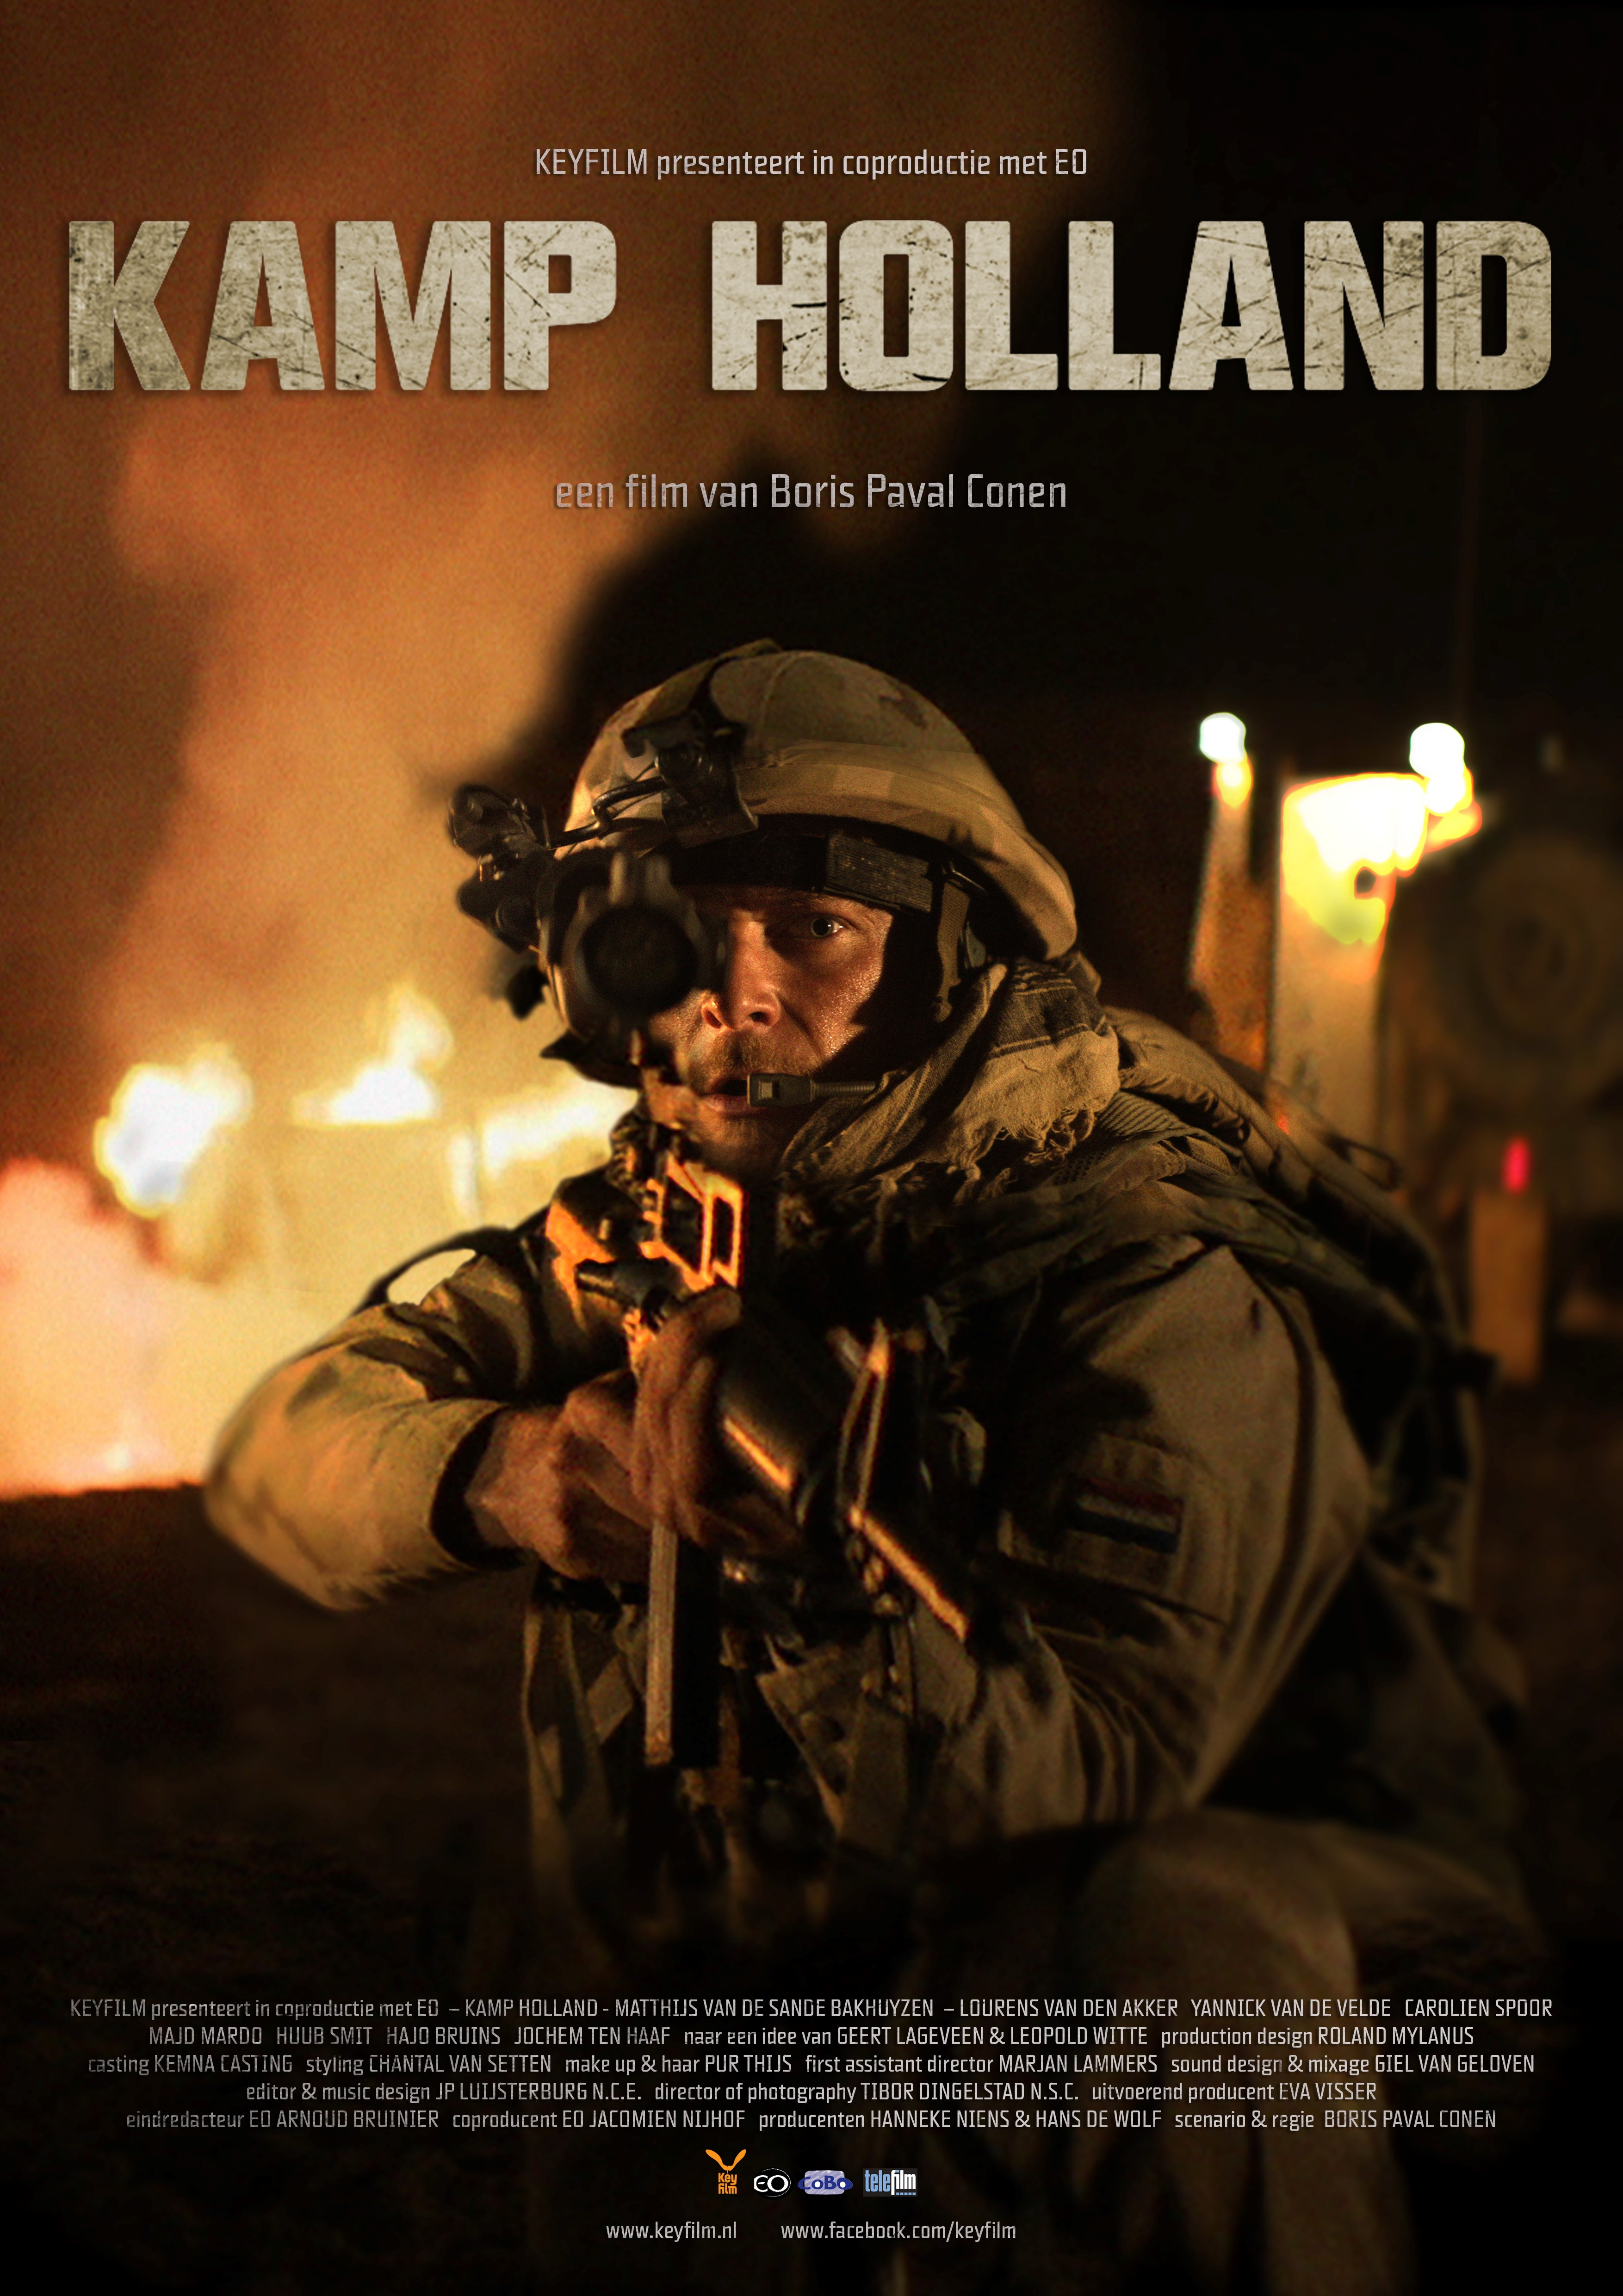 Kamp Holland [Dub] – IMDB 6.5